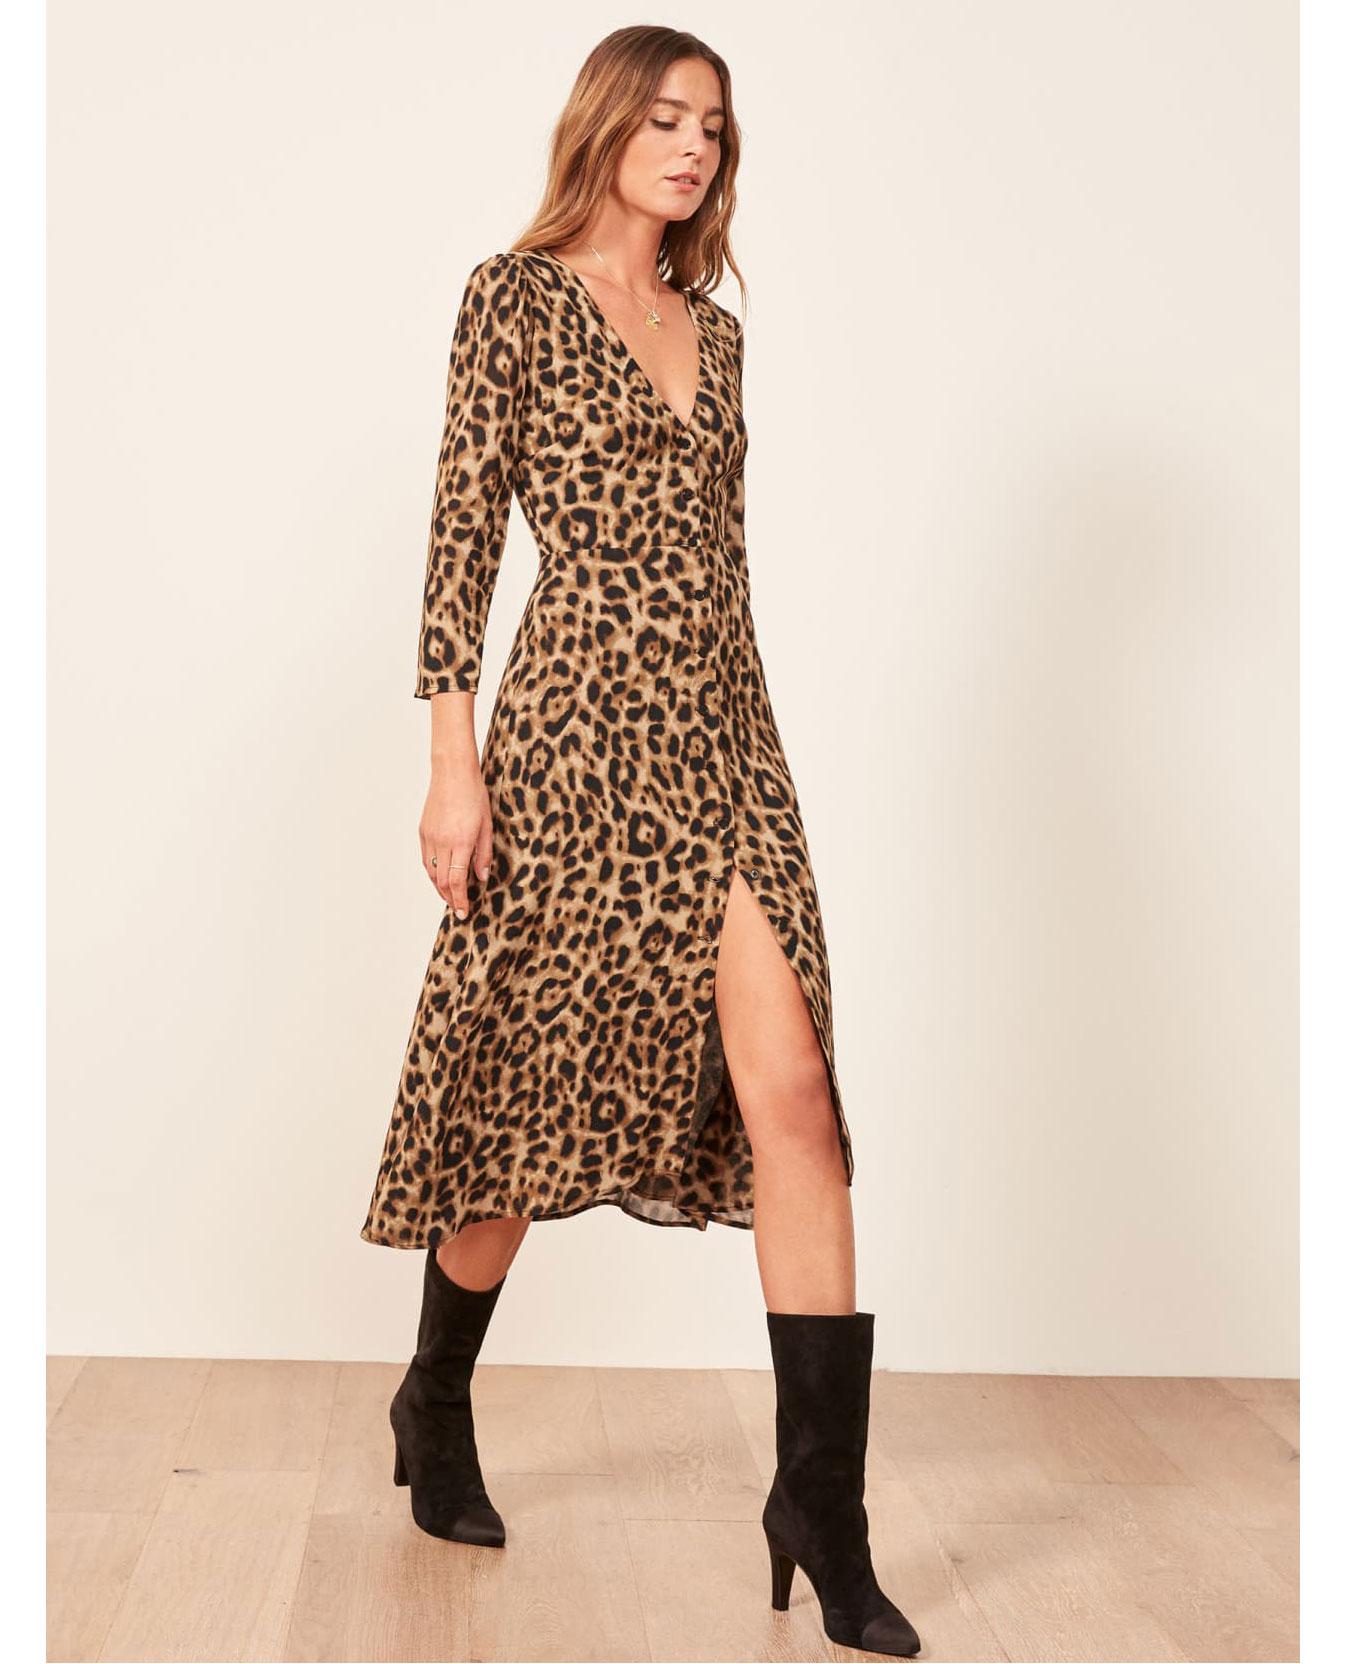 Reformation Leopard dress     $218